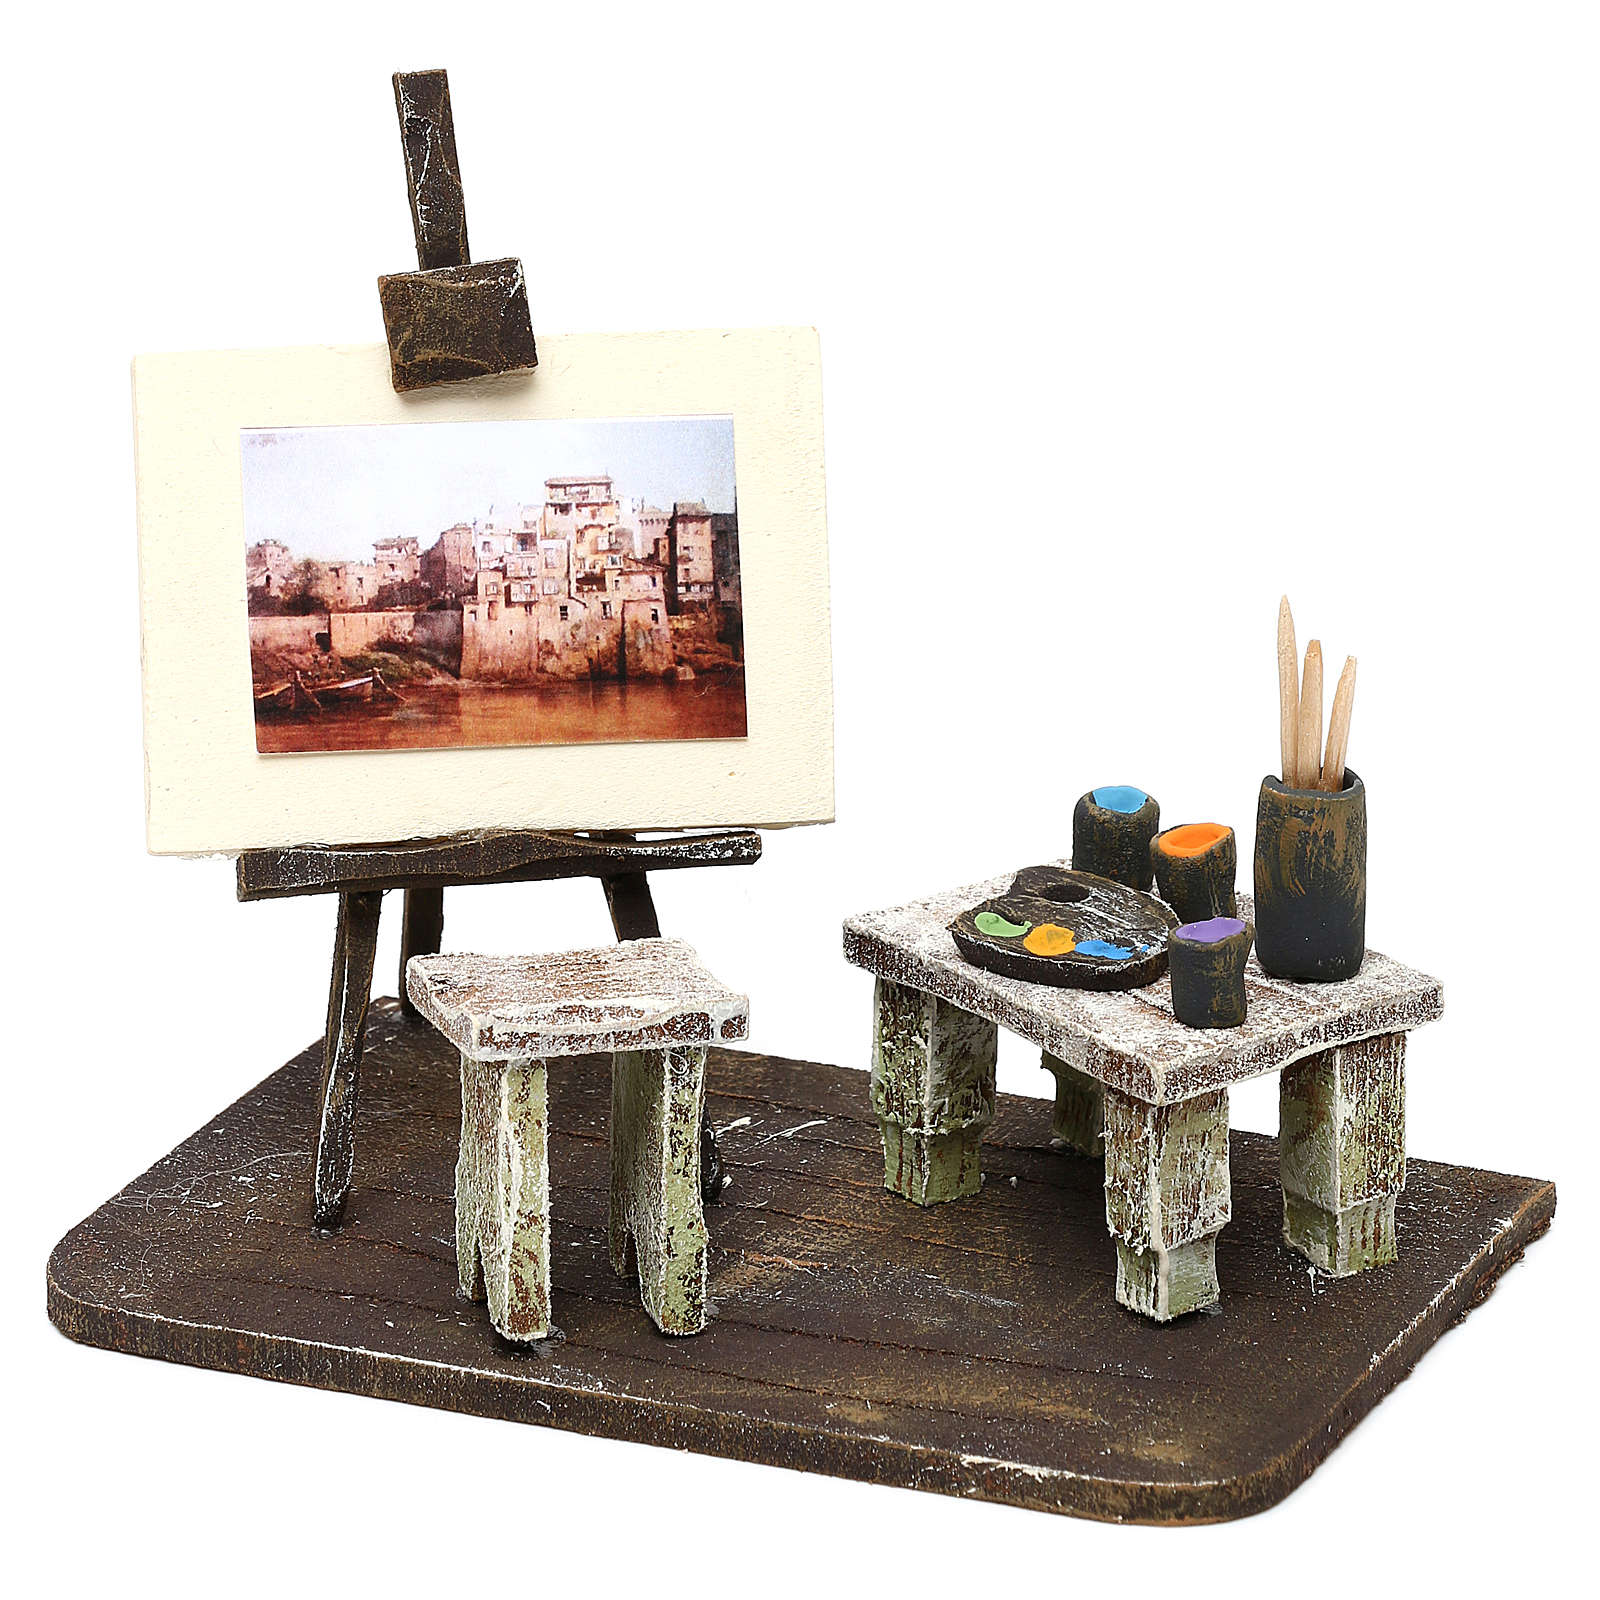 Atelier del pittore resina presepe 12 cm 10x15x10 cm 4